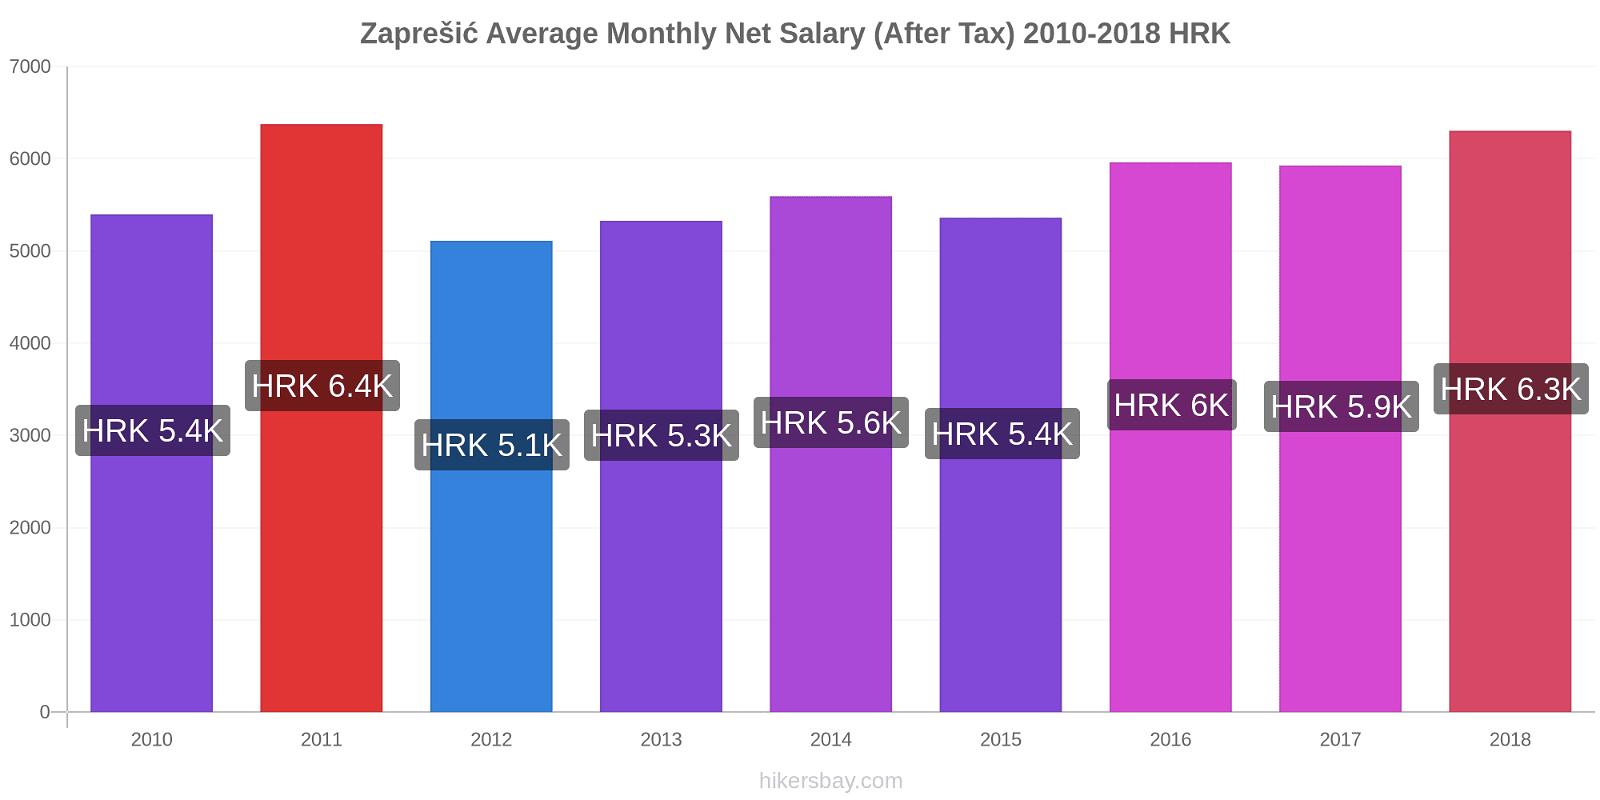 Zaprešić price changes Average Monthly Net Salary (After Tax) hikersbay.com